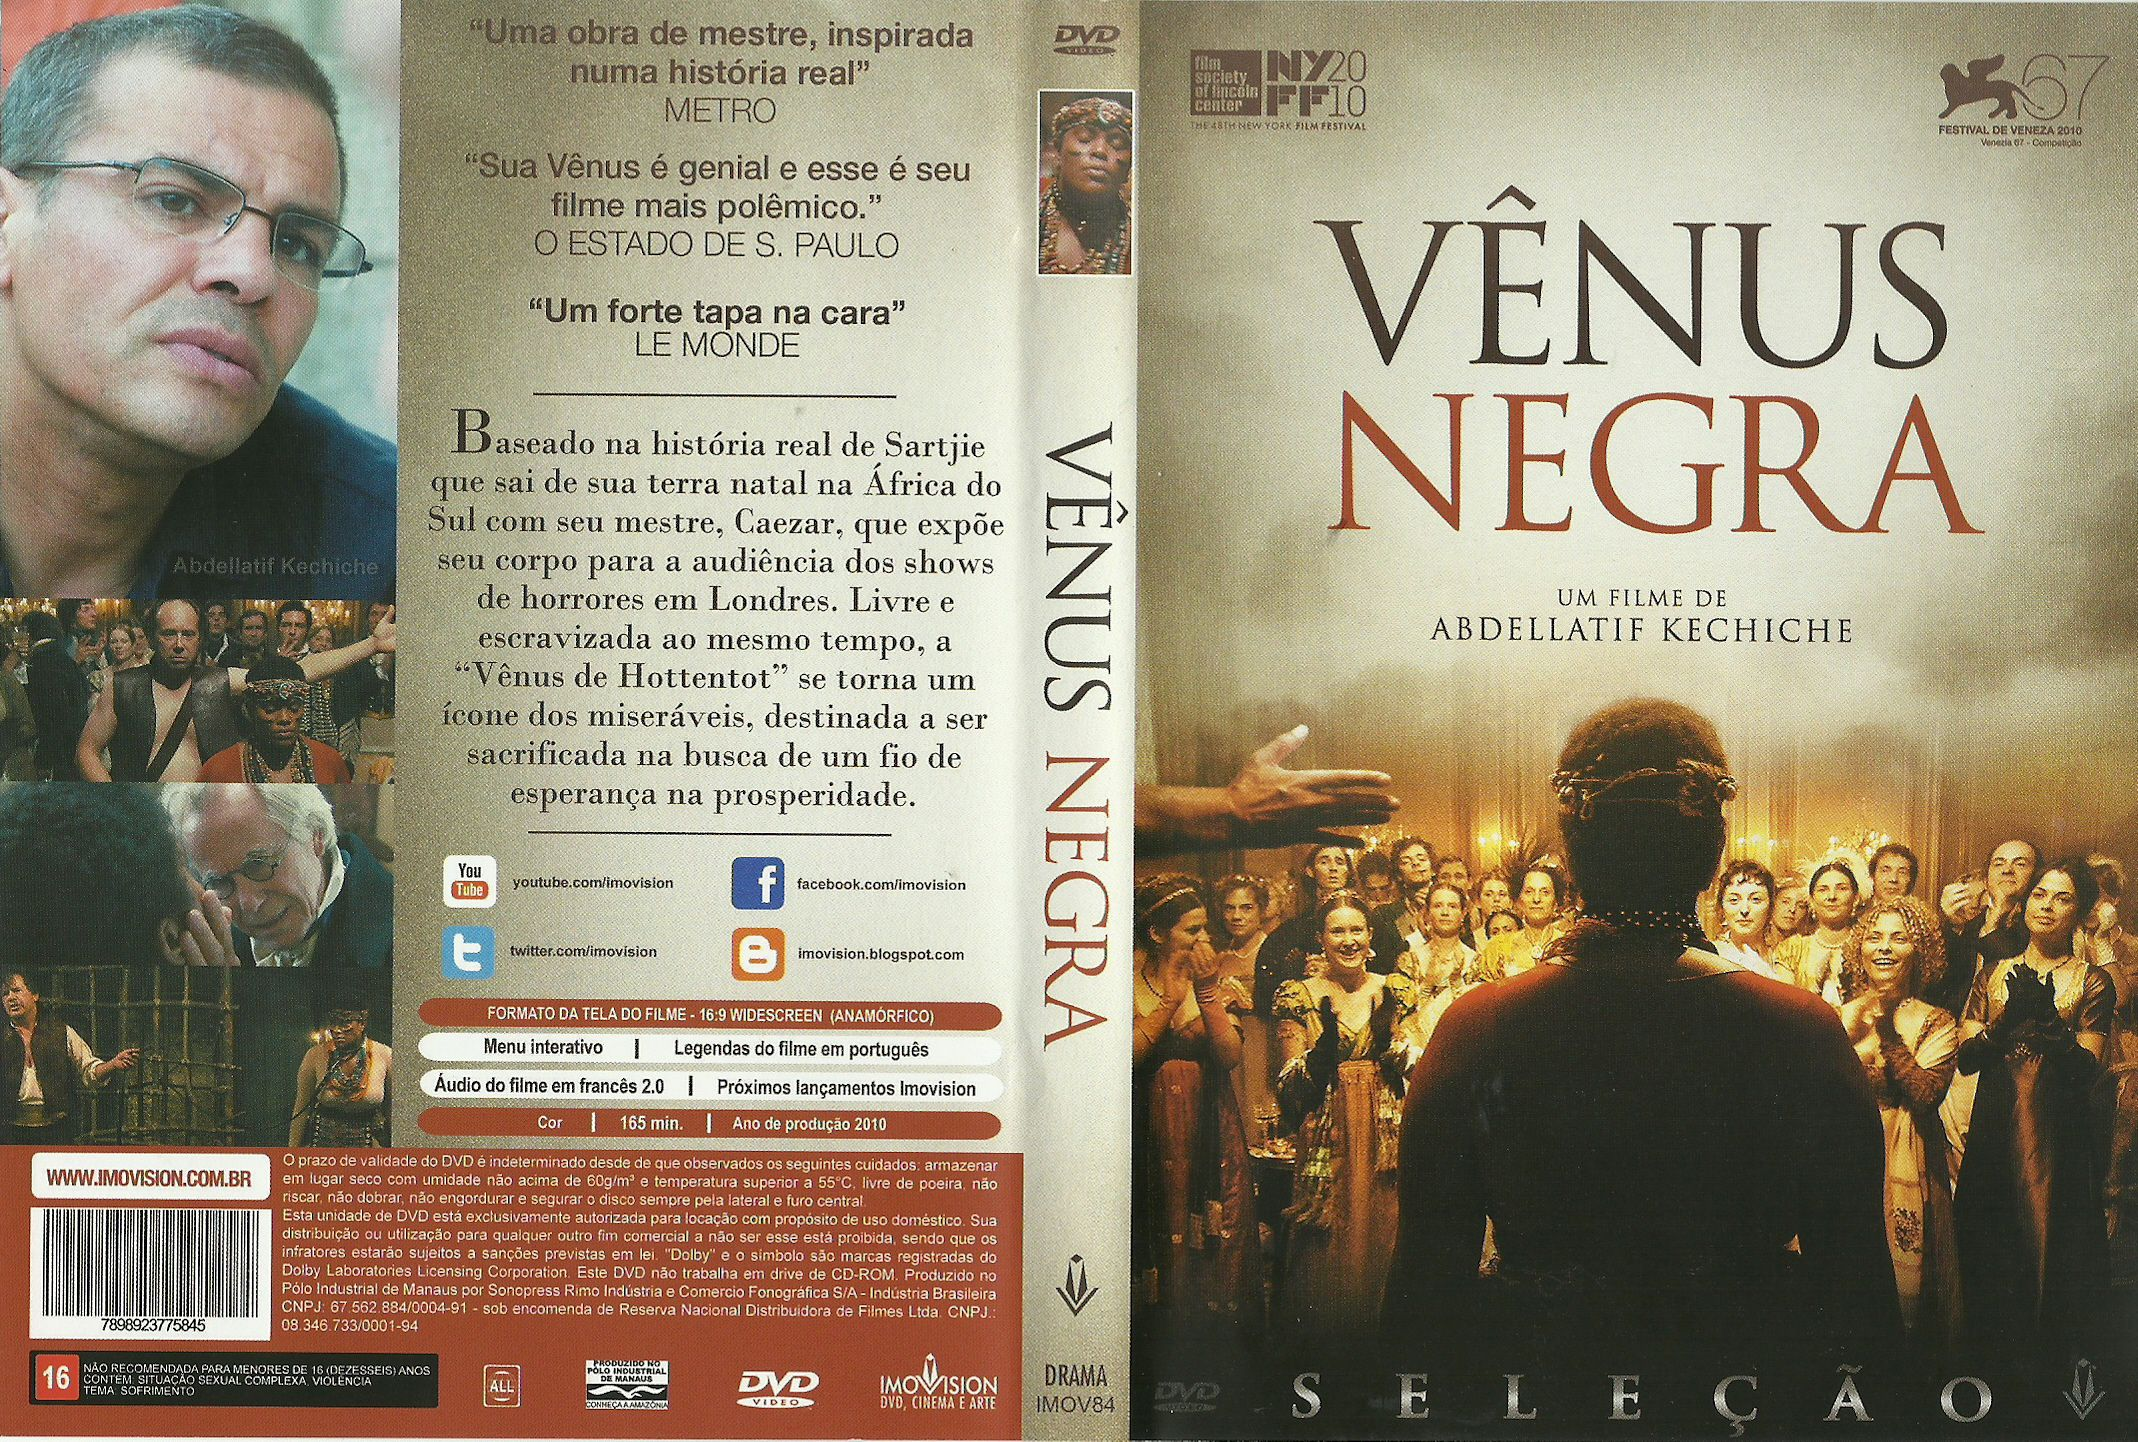 Capa DVD Vênus Negra